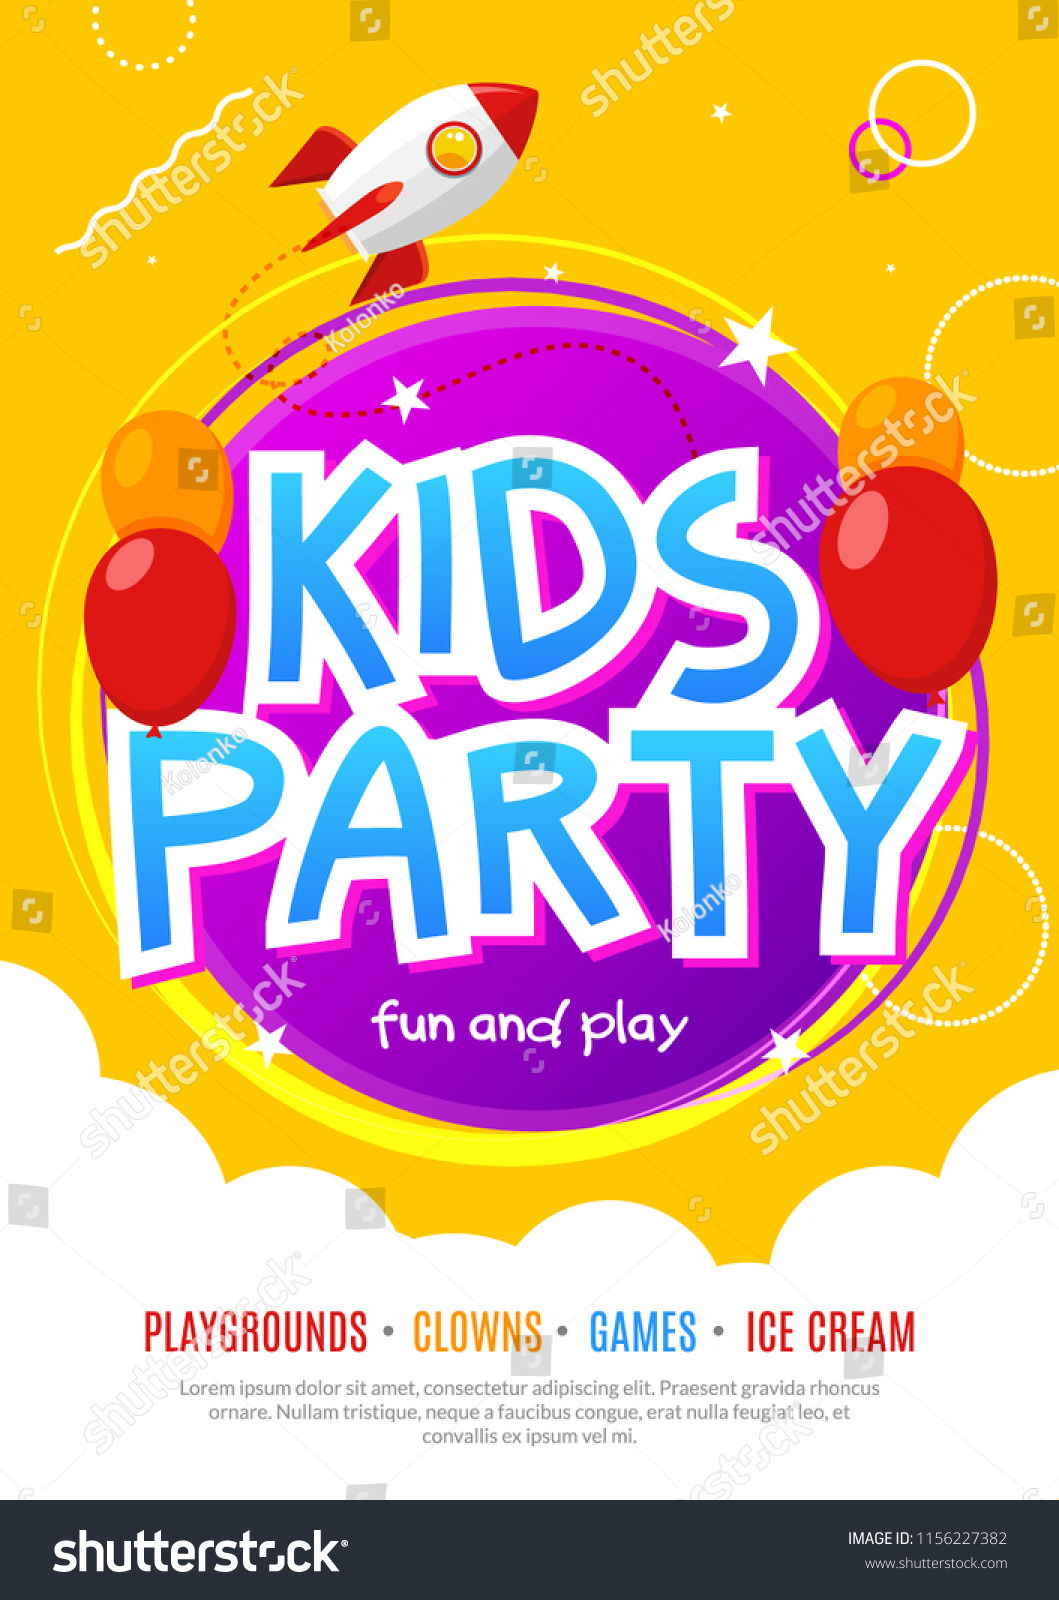 kids fun party celebration flyer design stock vector royalty free